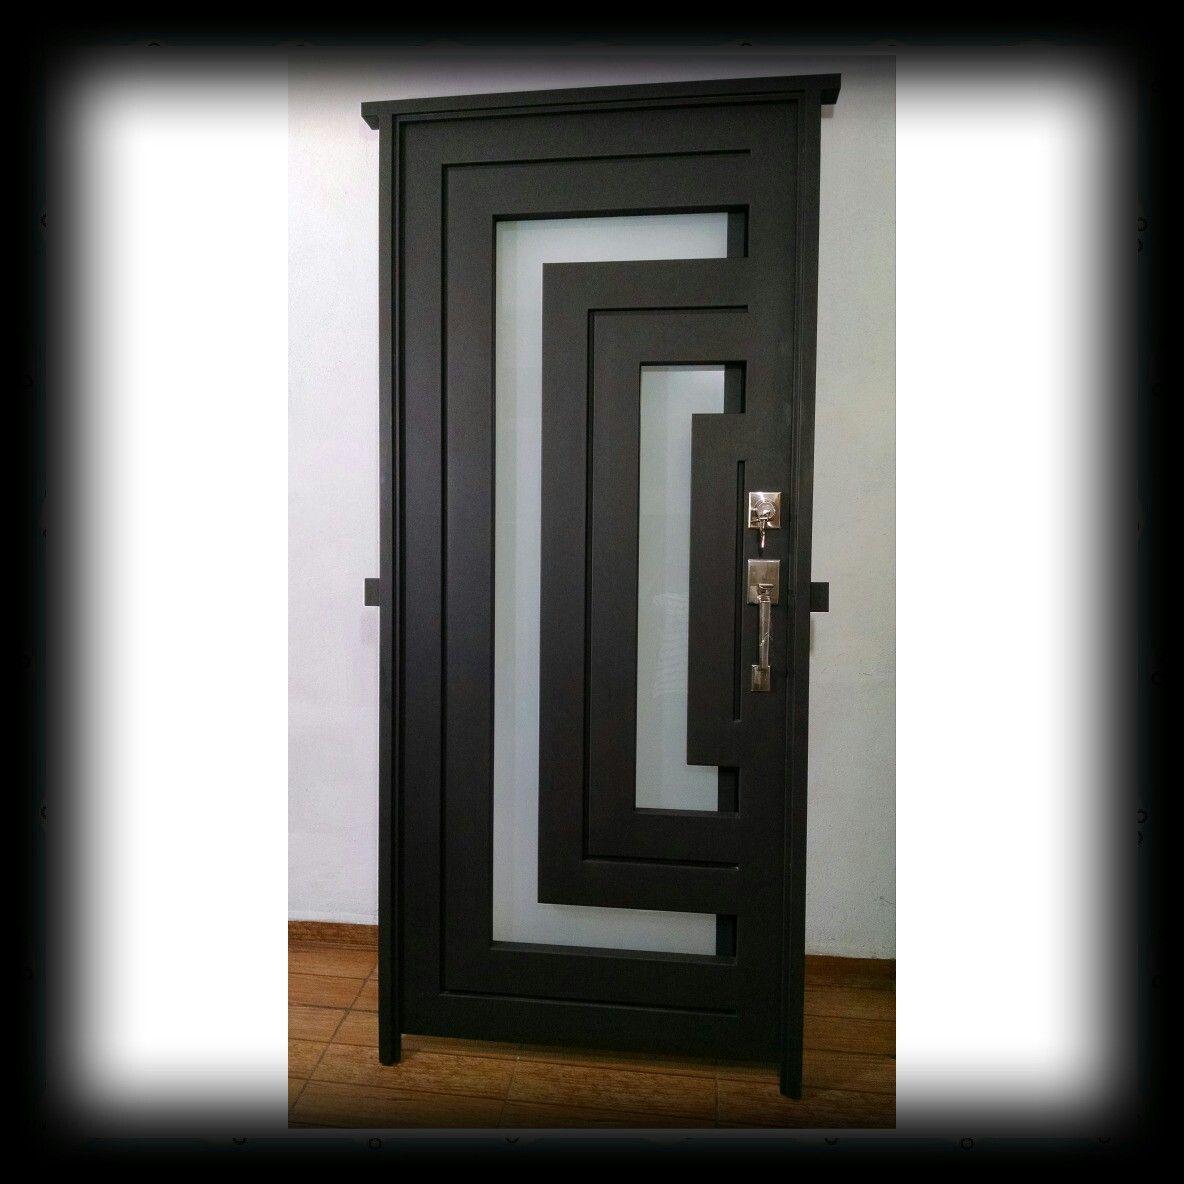 Puerta de entrada aluminio pinterest puerta de for Puertas de hierro para casas modernas